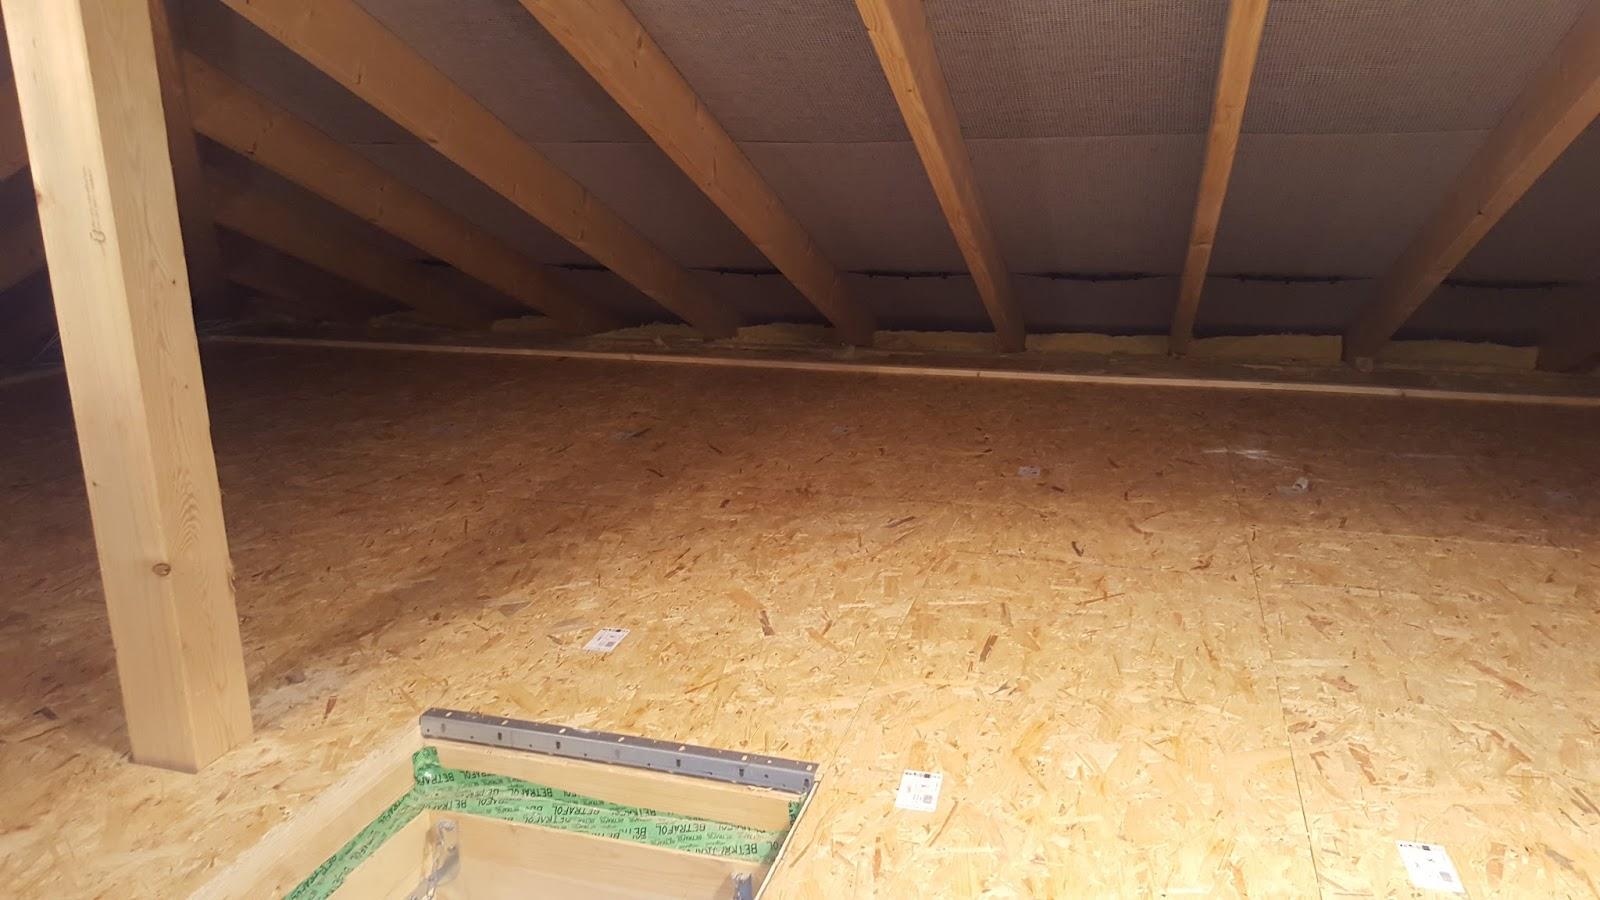 Massivhaus Rhein Lahn baublog wir bauen in neesbach ausbau des dachbodens